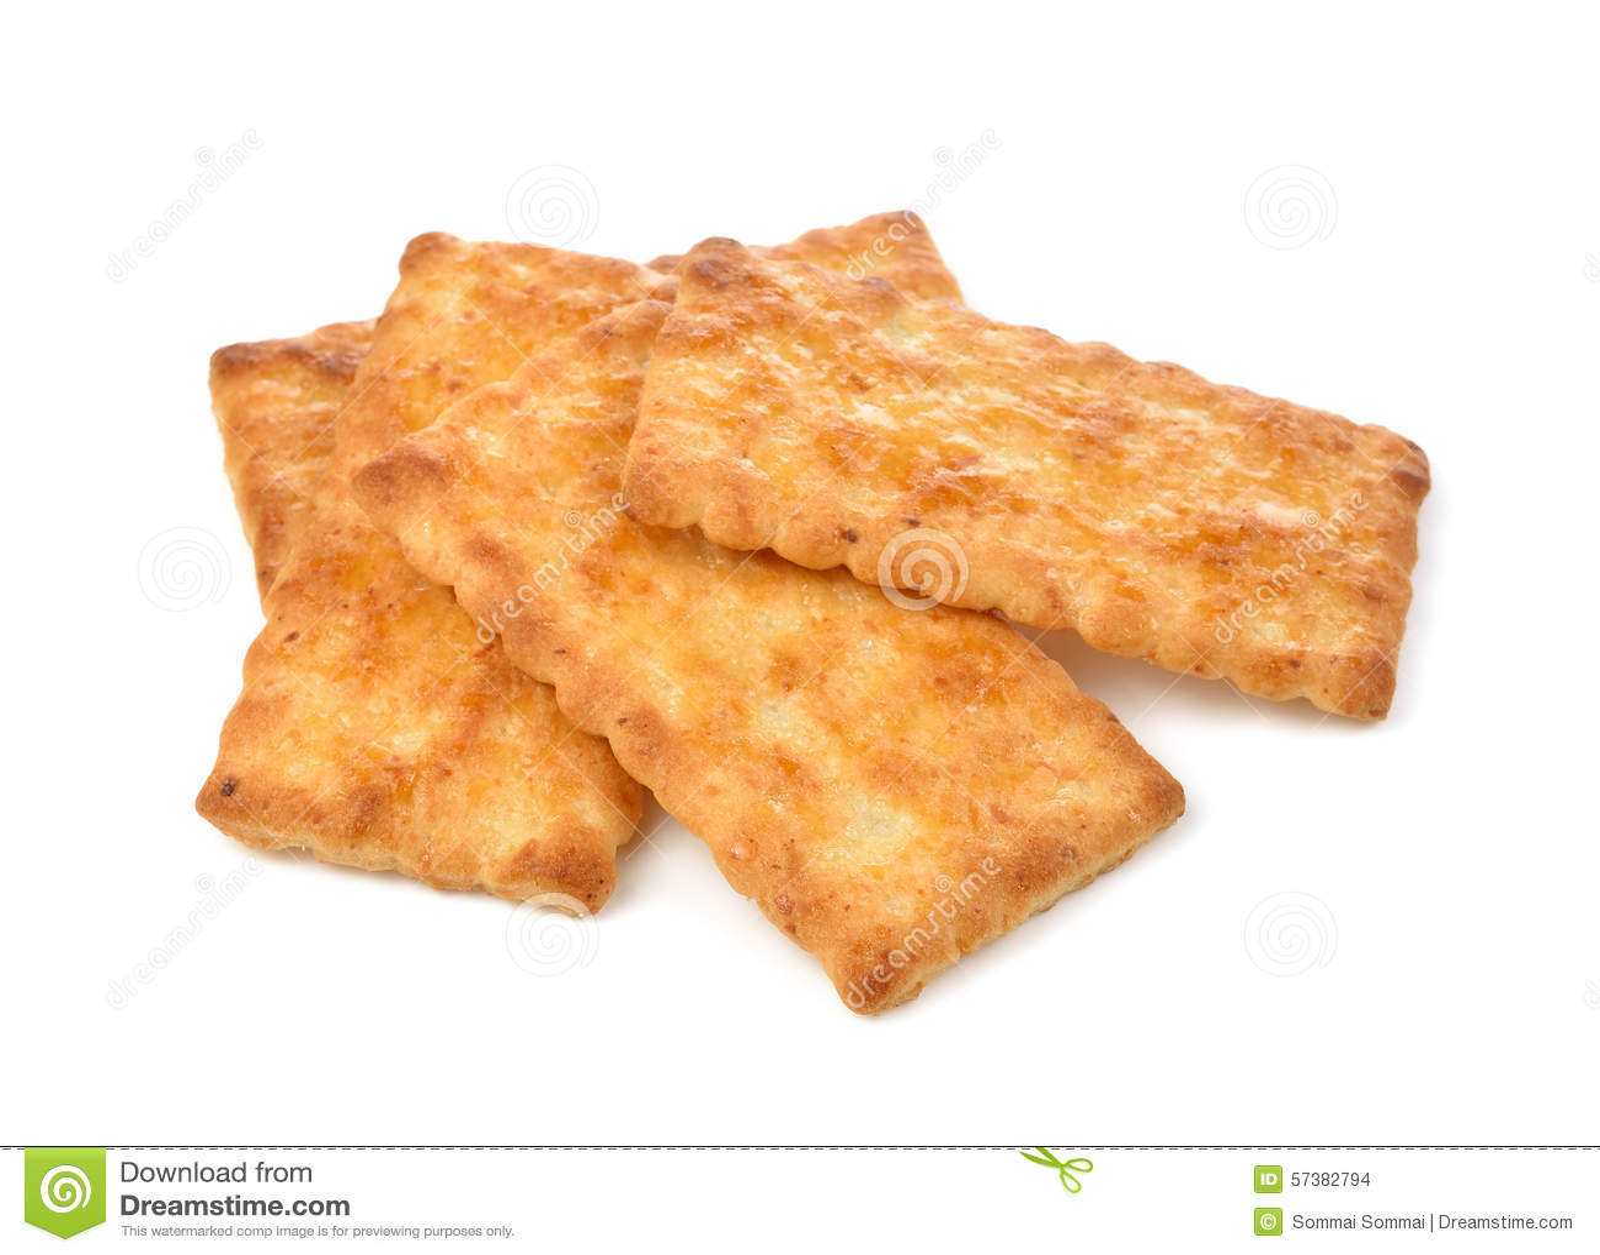 Cracker die op witte achtergrond wordt geïsoleerdg